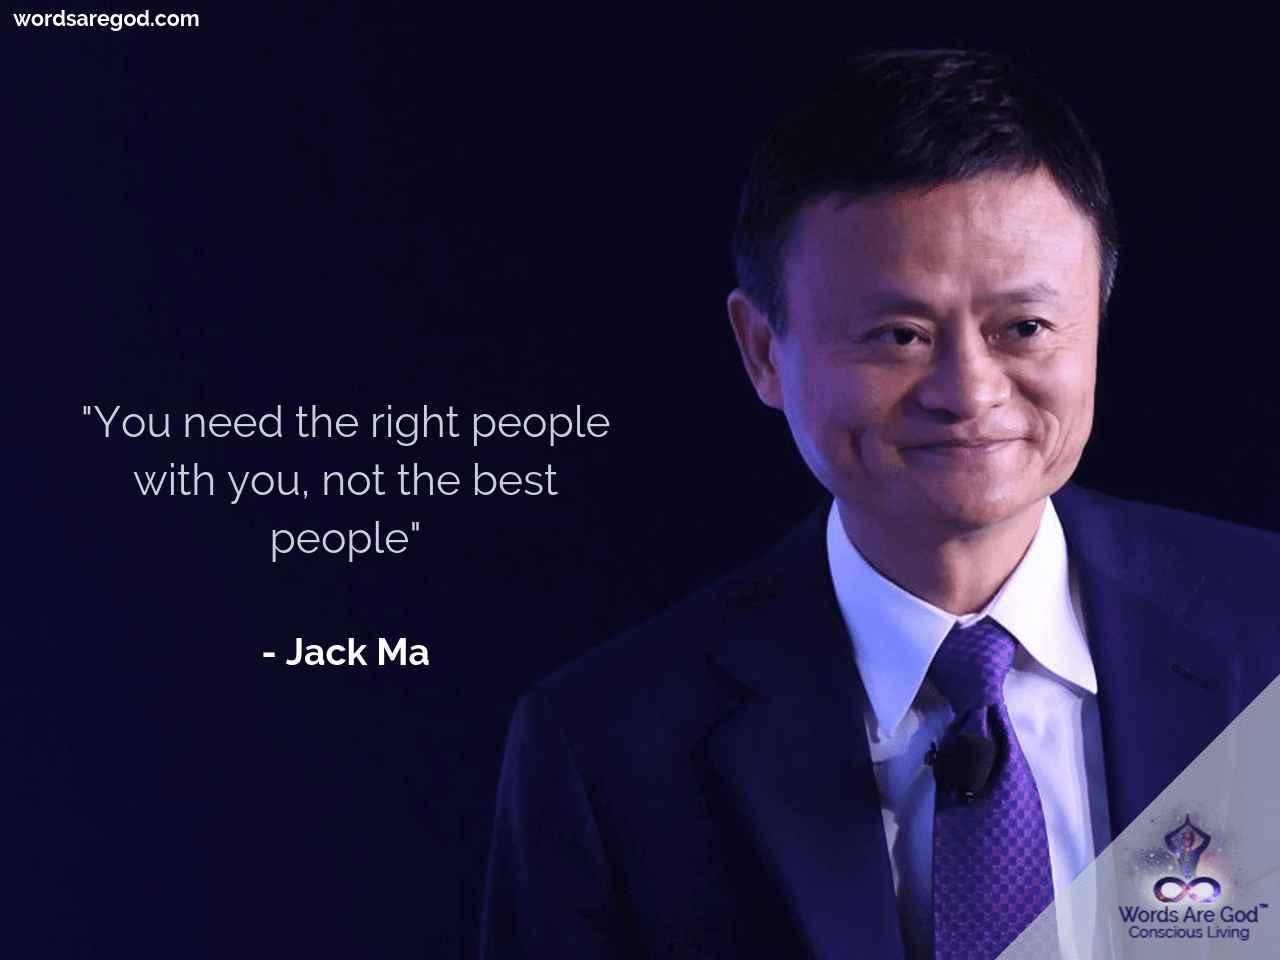 Jack Ma Inspirational Quote by Jack Ma